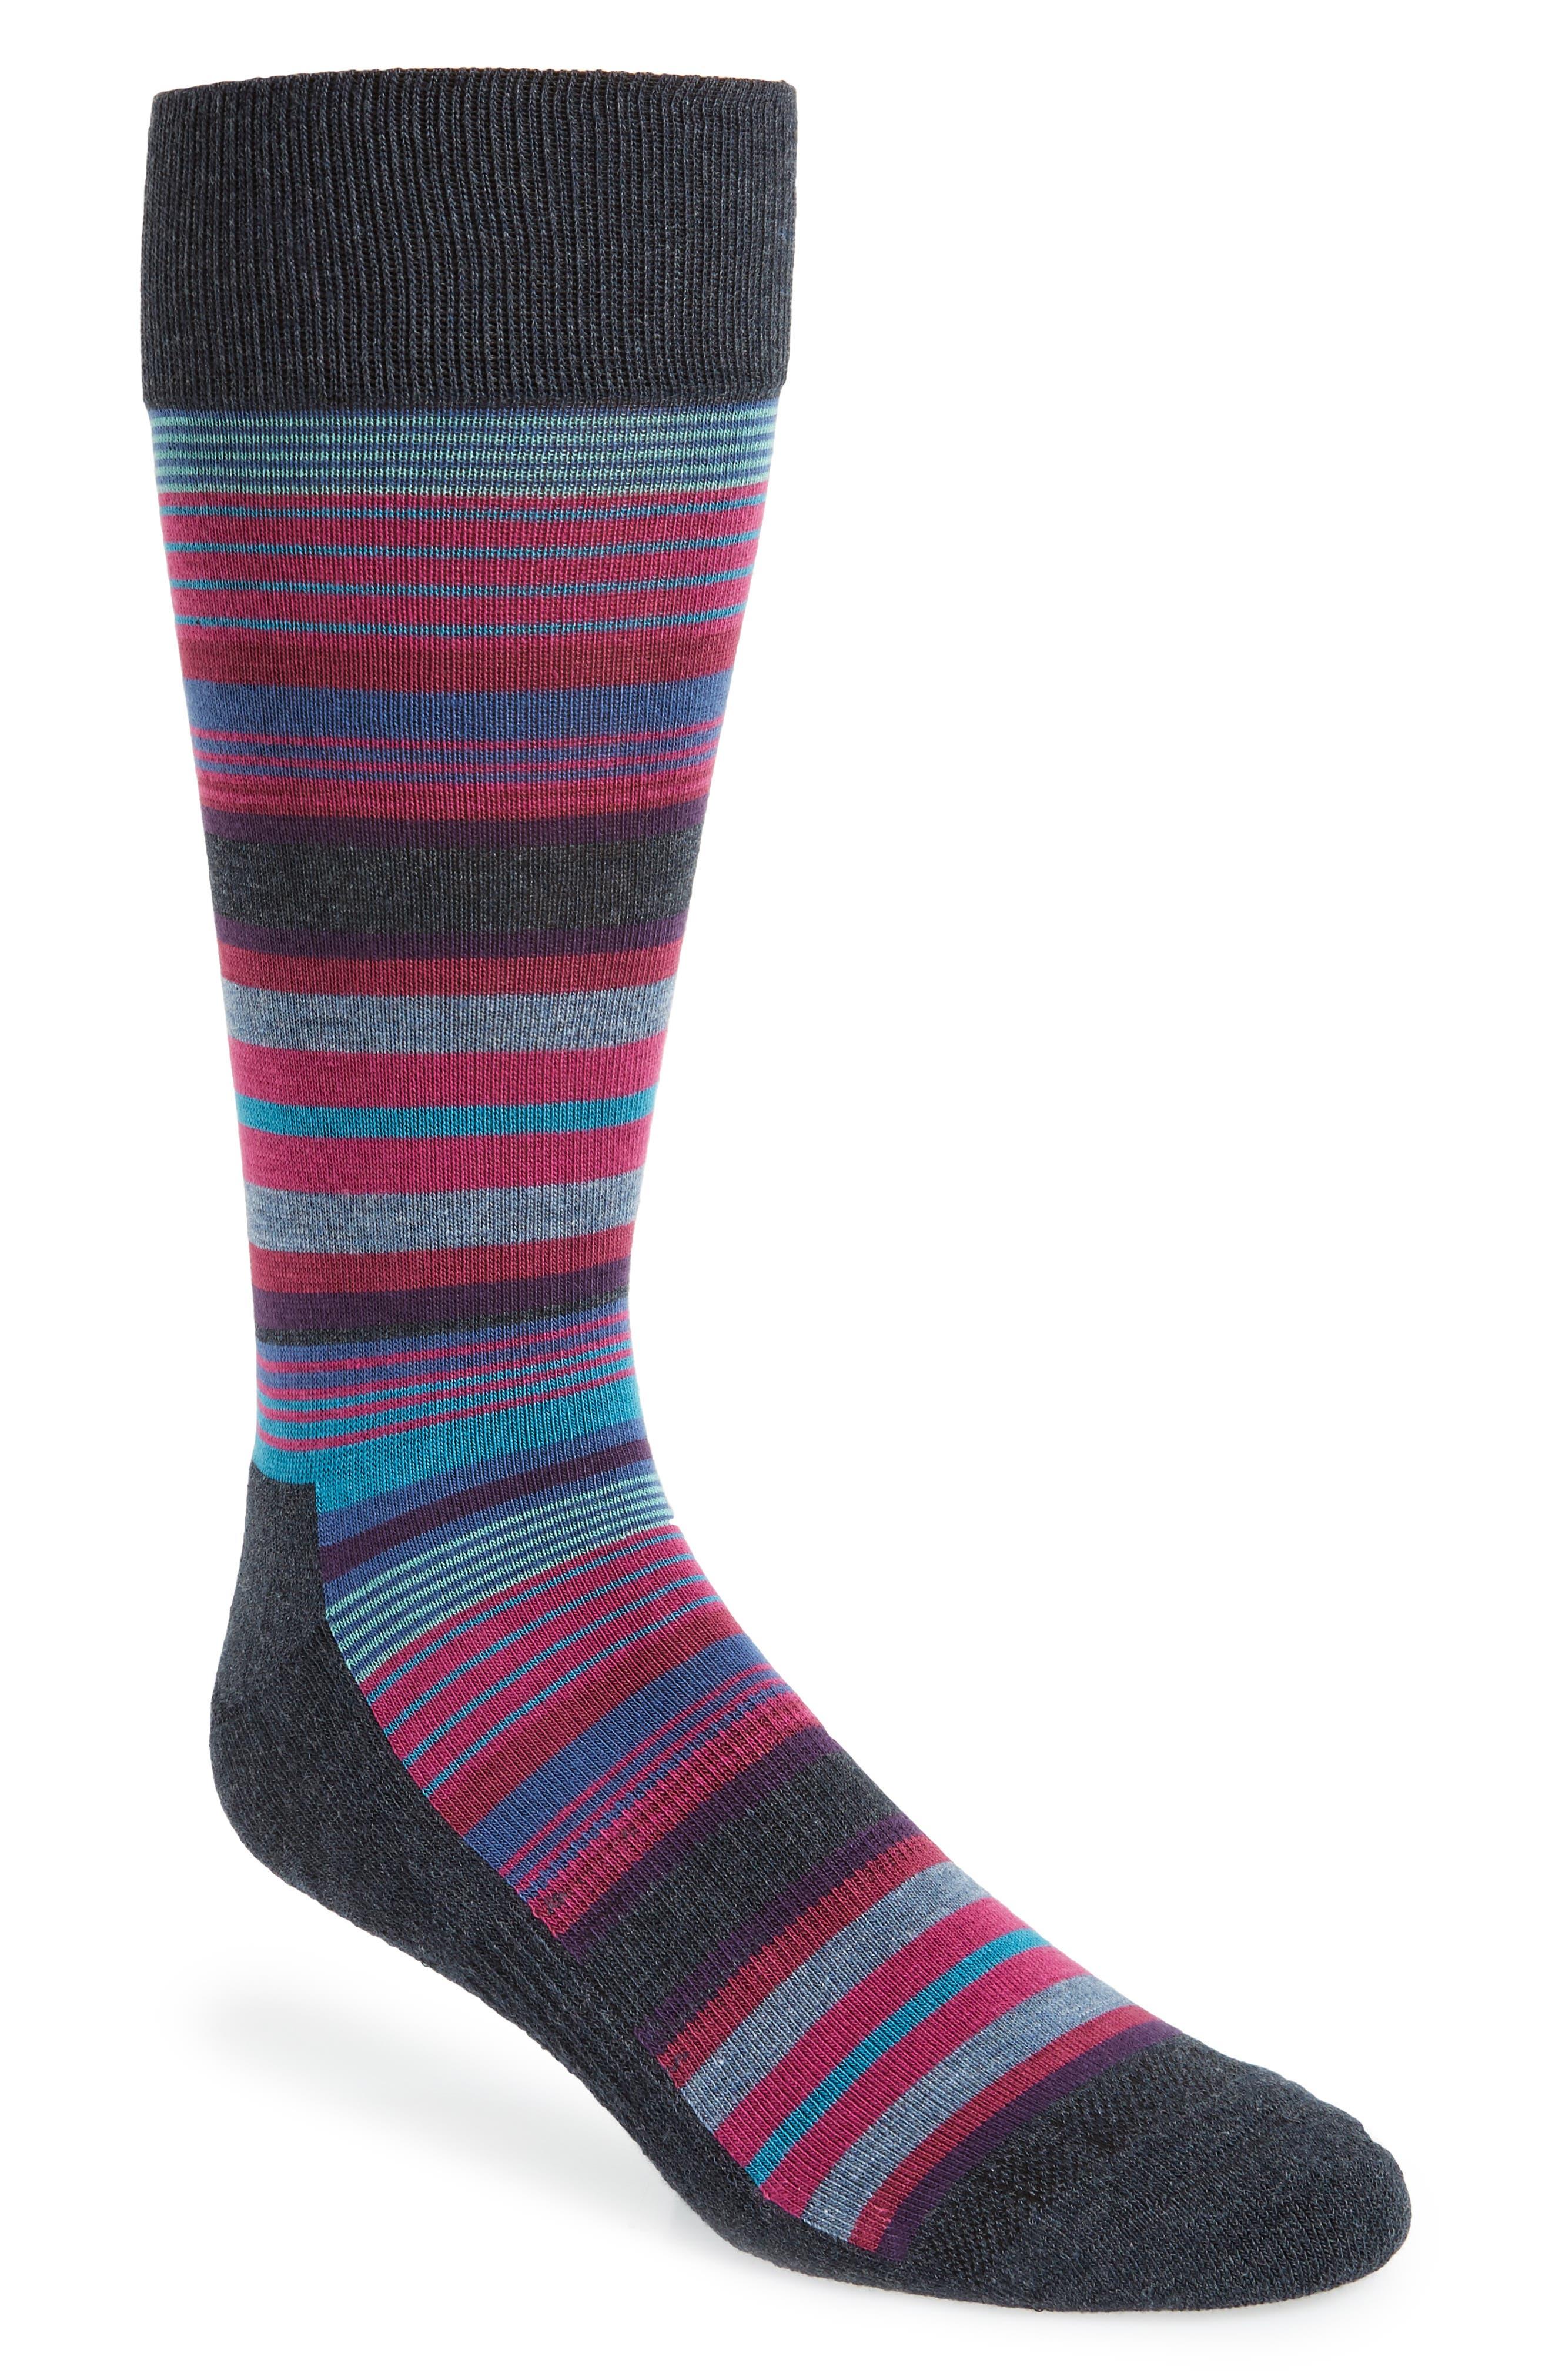 Variegated Stripes Socks,                             Main thumbnail 1, color,                             410